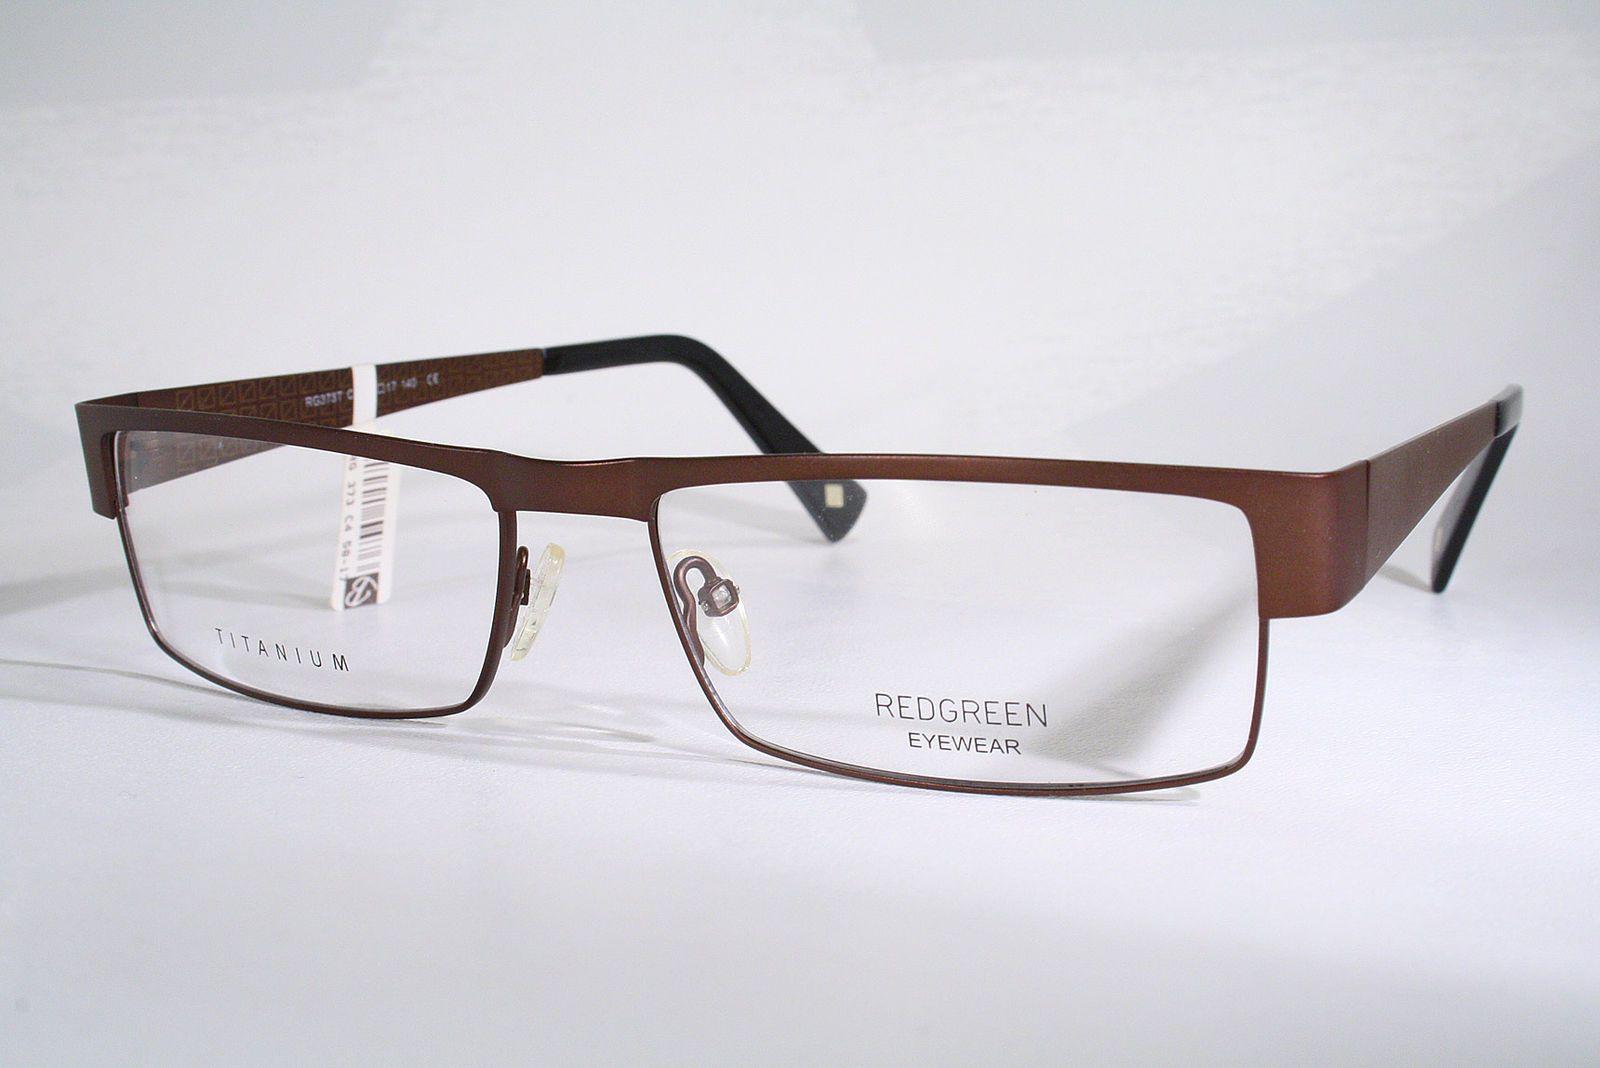 69de96f247 REDGREEN New TITANIUM Brown Danish Design Eyeglass Frames Mens Large Nickel  Free